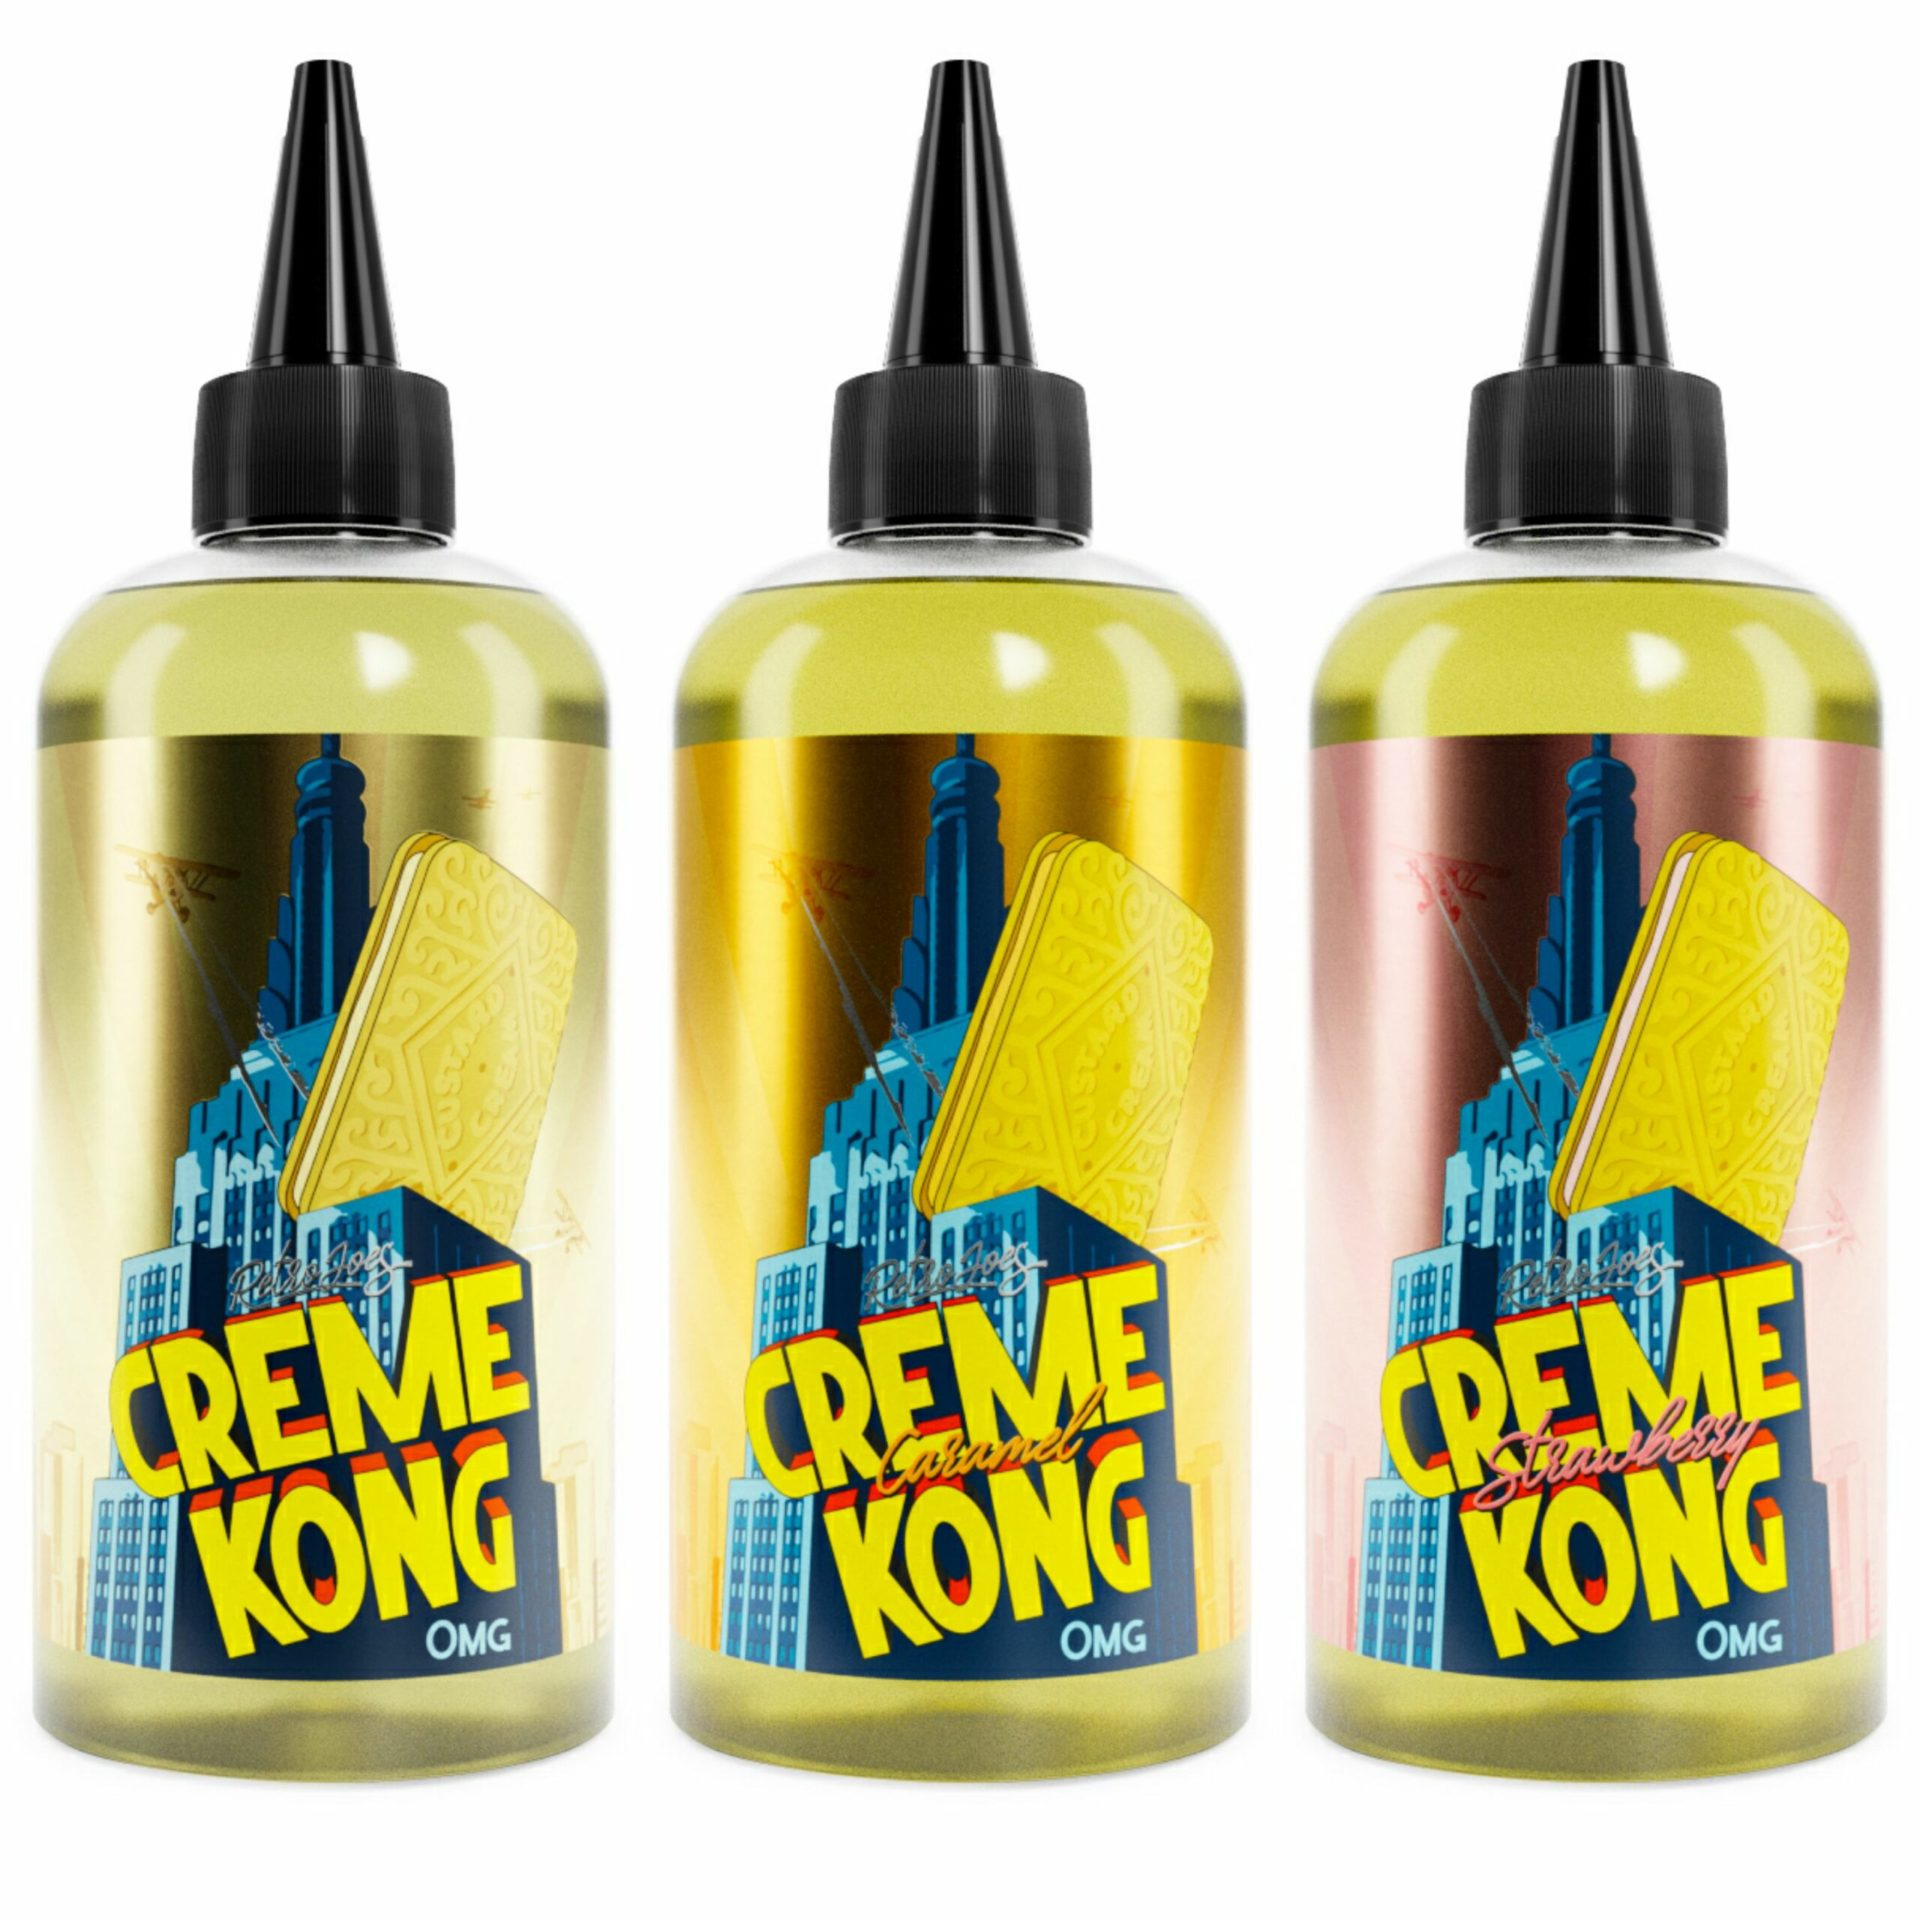 CREME KONG RANGE SHORTFILL ELIQUID BY JOES JUICE